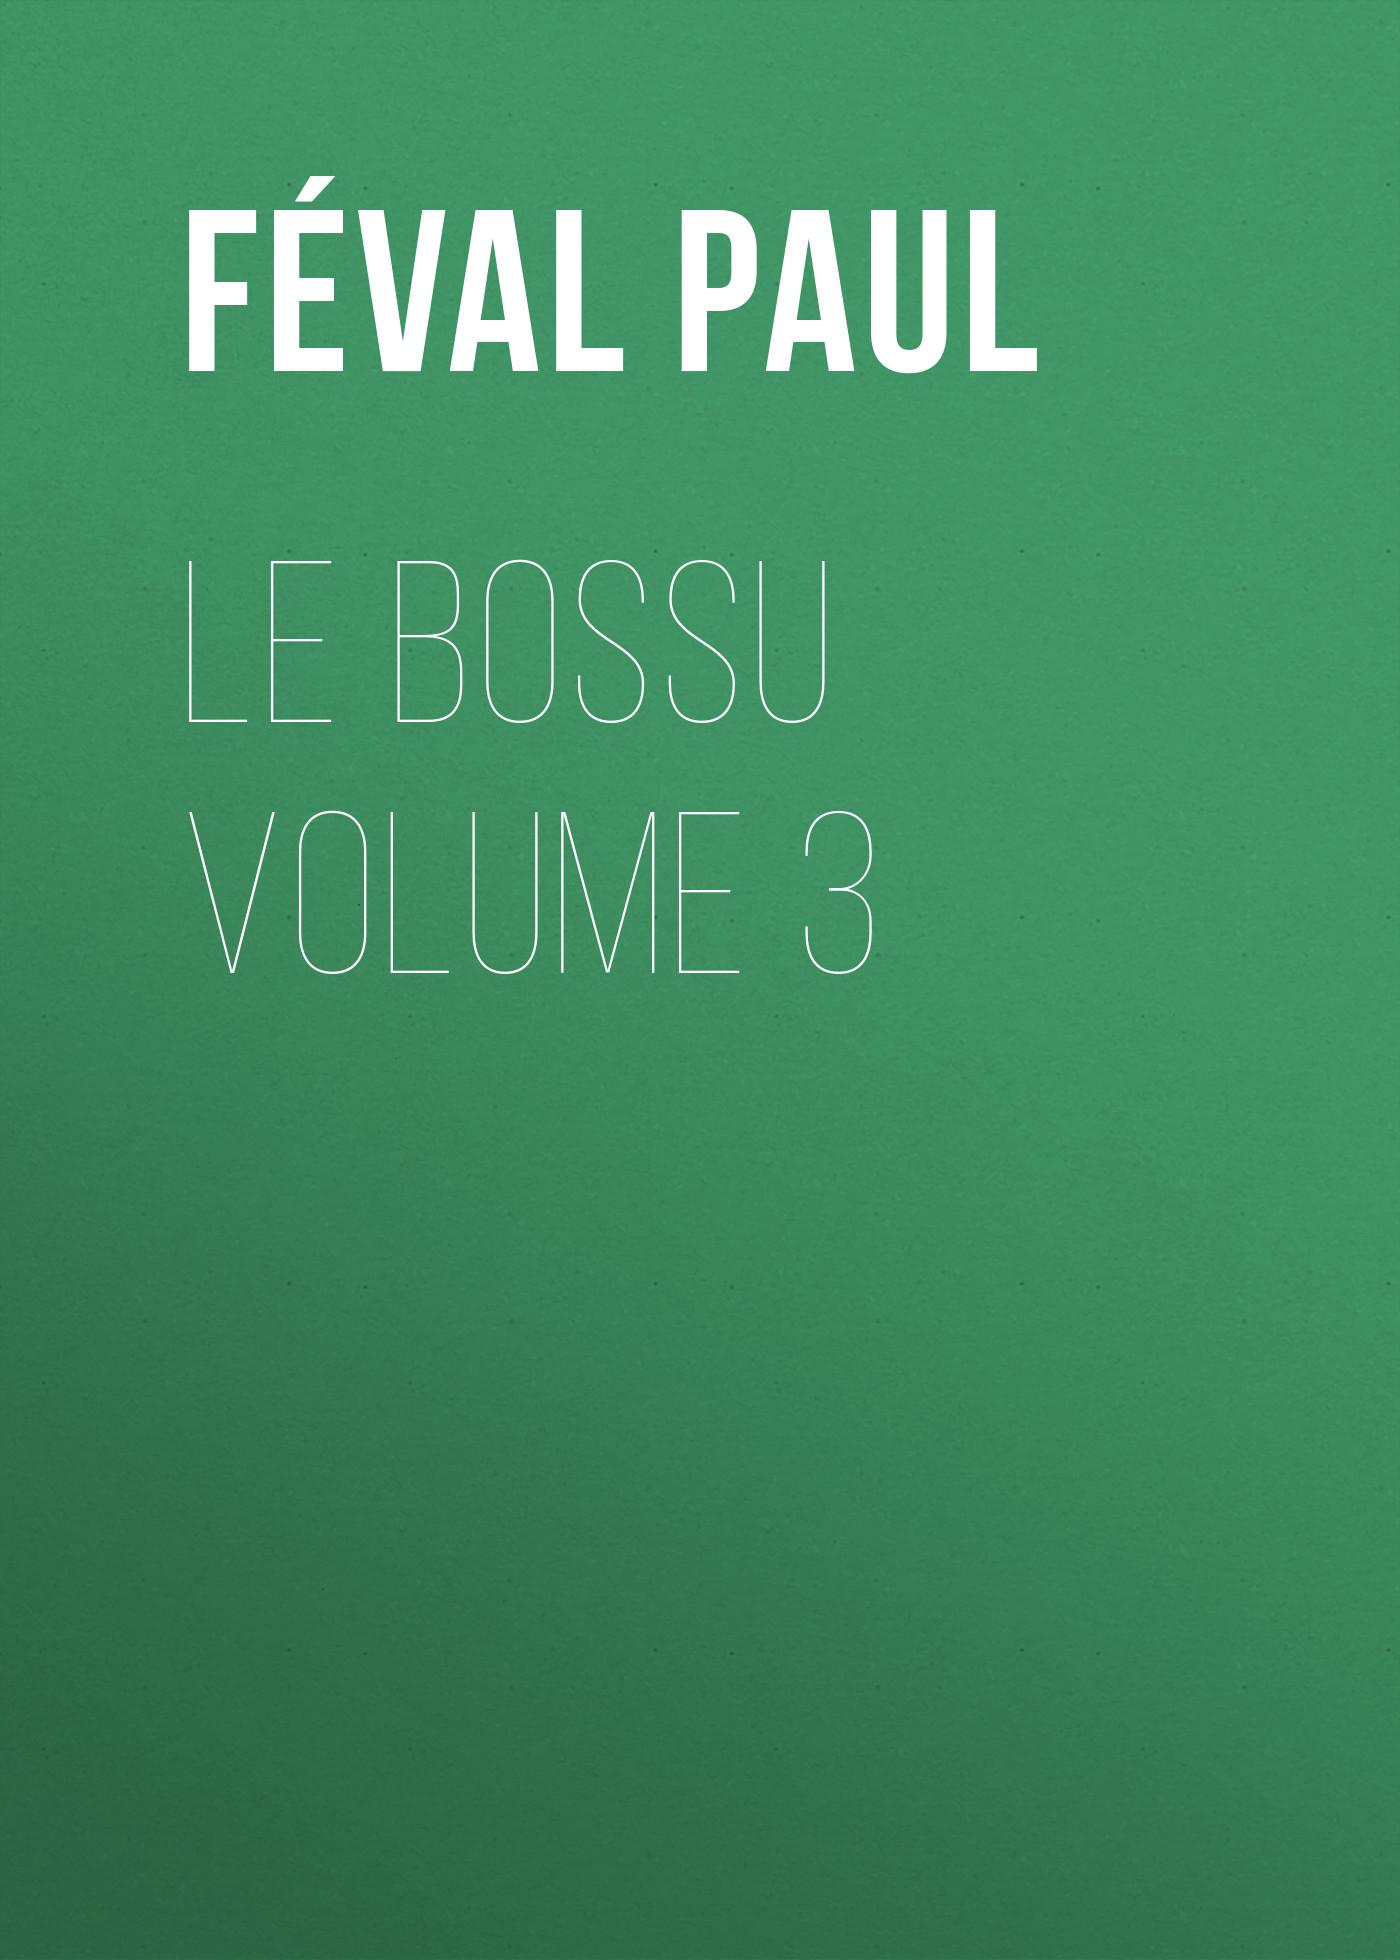 Фото - Féval Paul Le Bossu Volume 3 jean paul gaultier le male